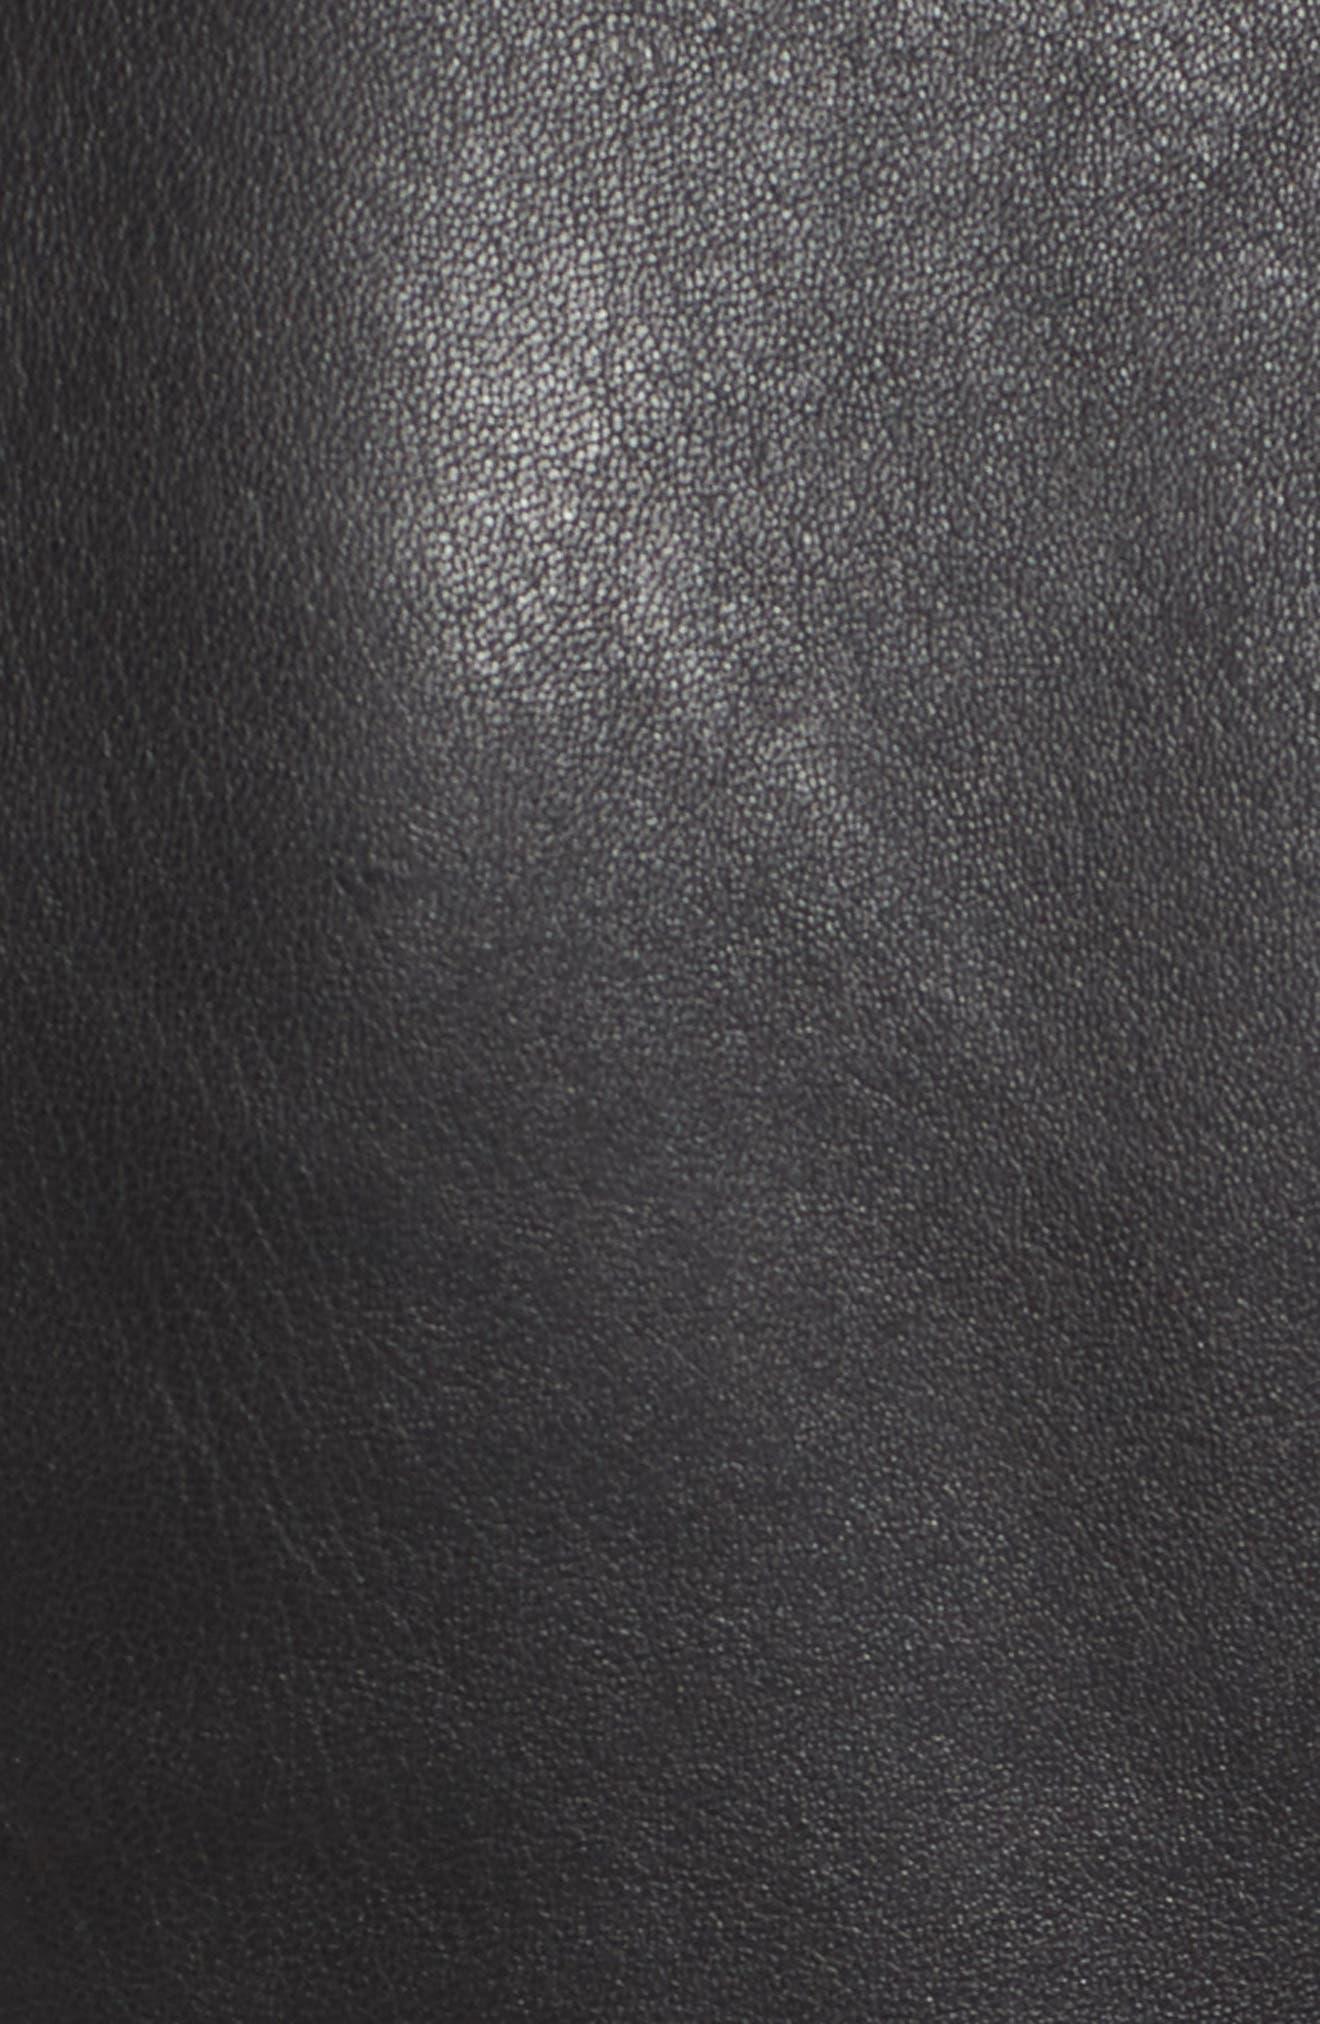 Highgrove Leather BIker Jacket,                             Alternate thumbnail 7, color,                             001